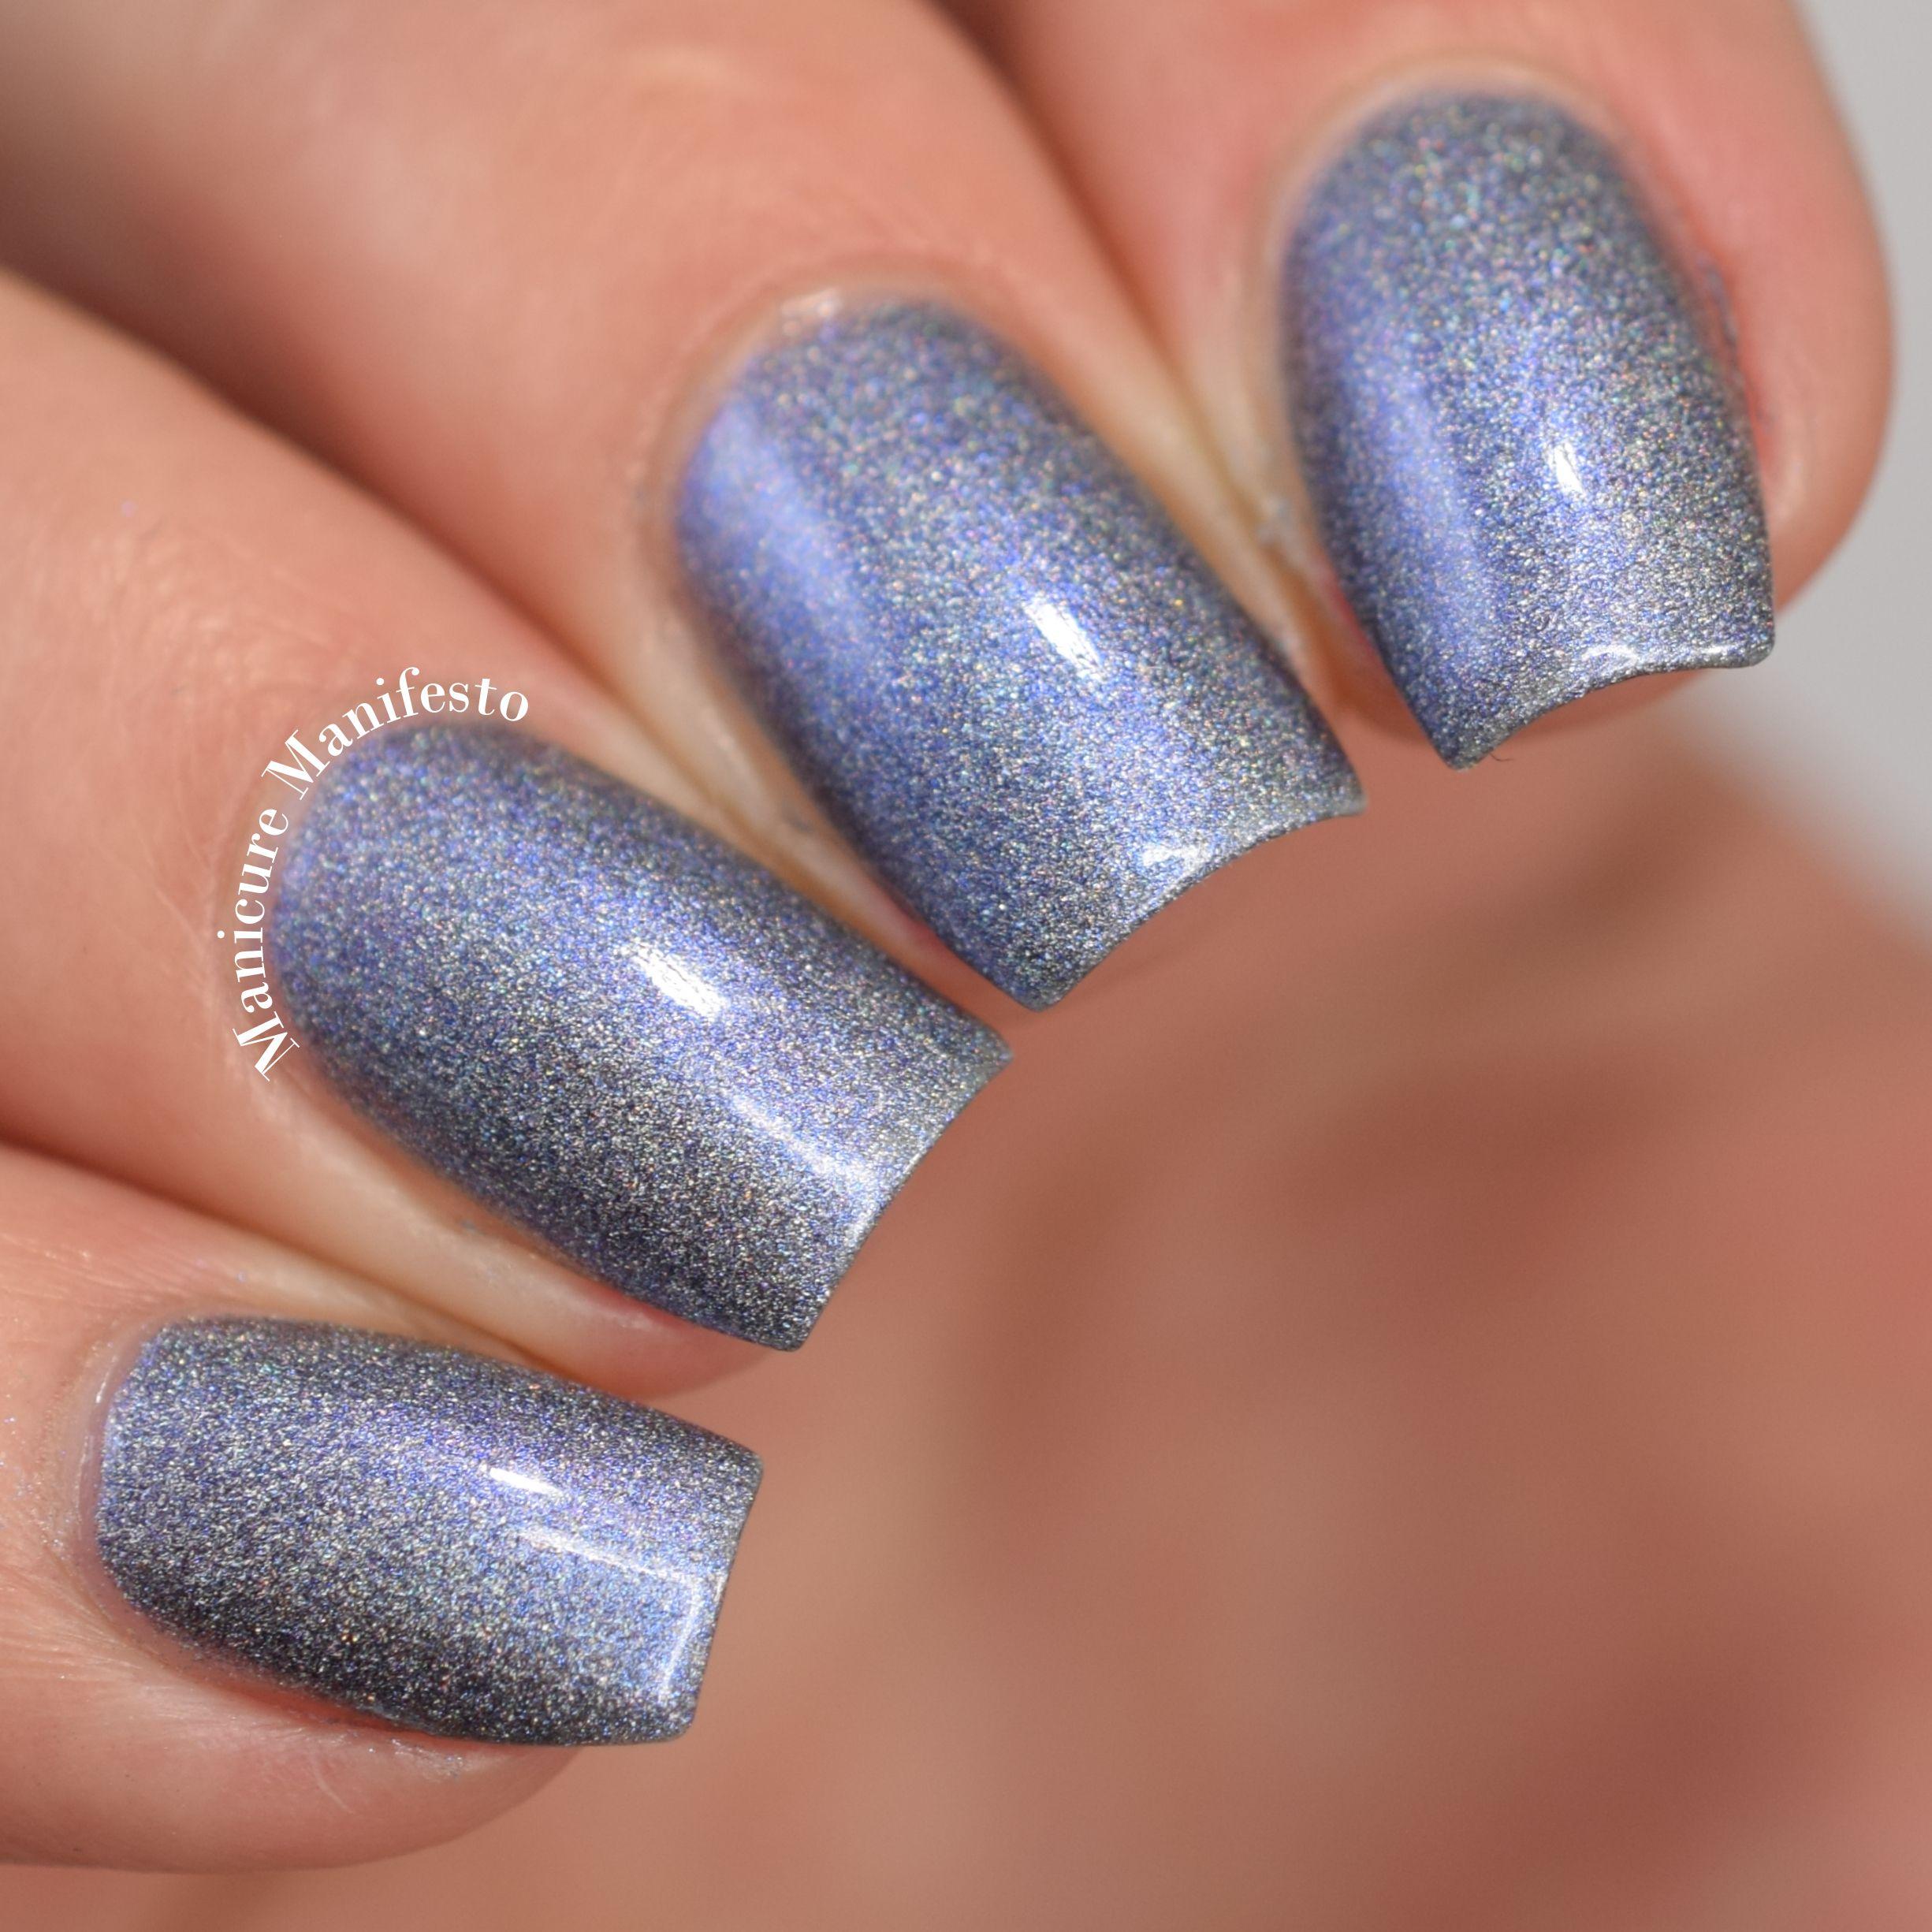 Brand Challenge A England (With images) Nail polish